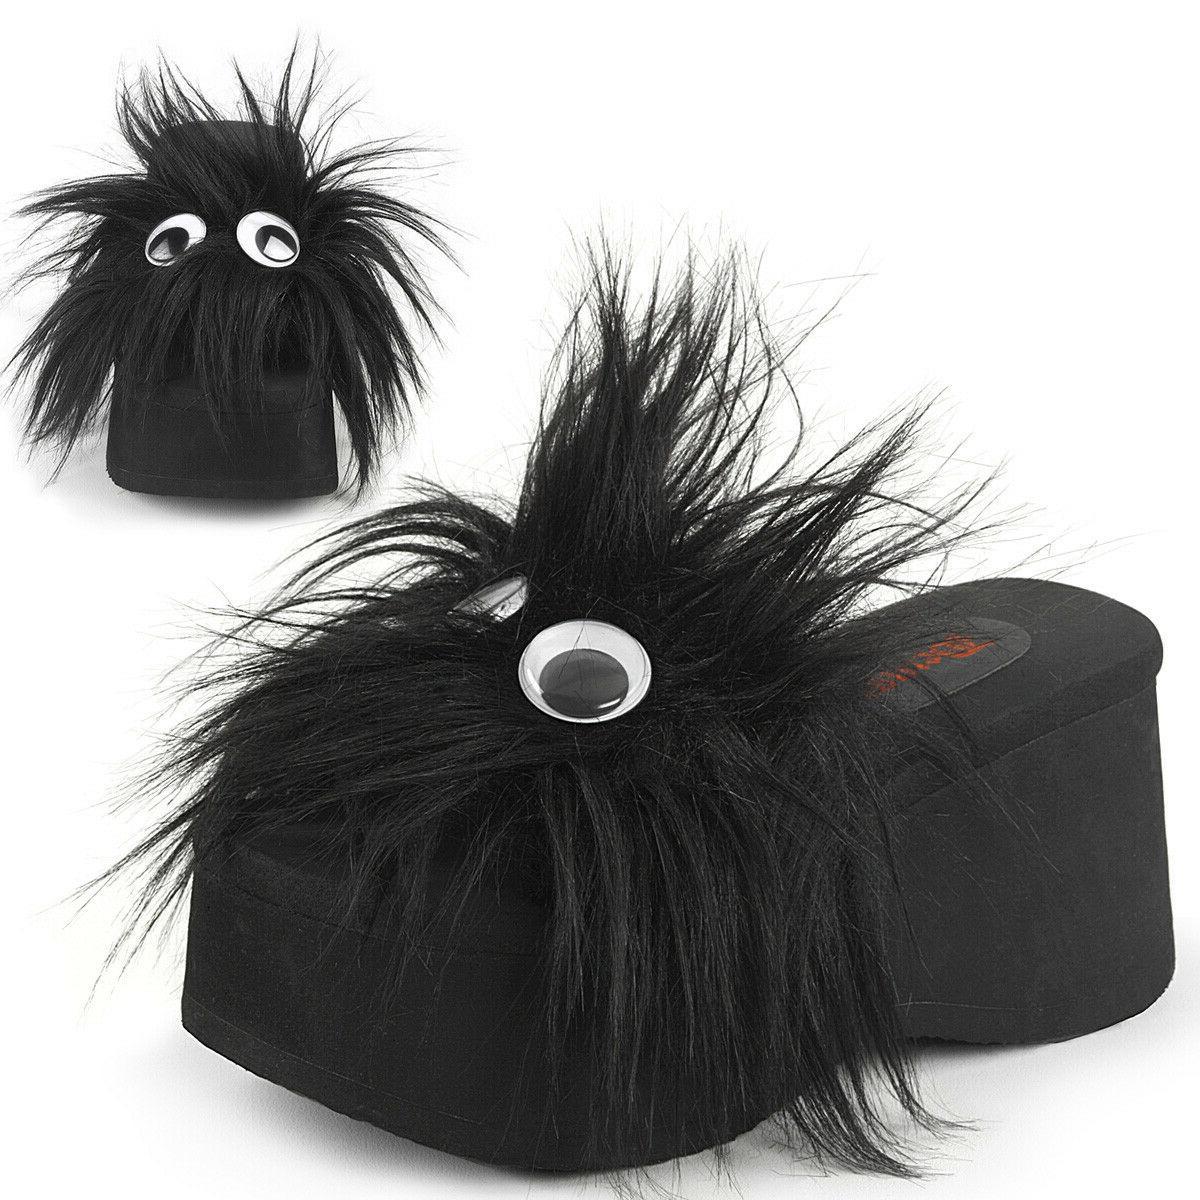 black platform furry monster alien flip flops